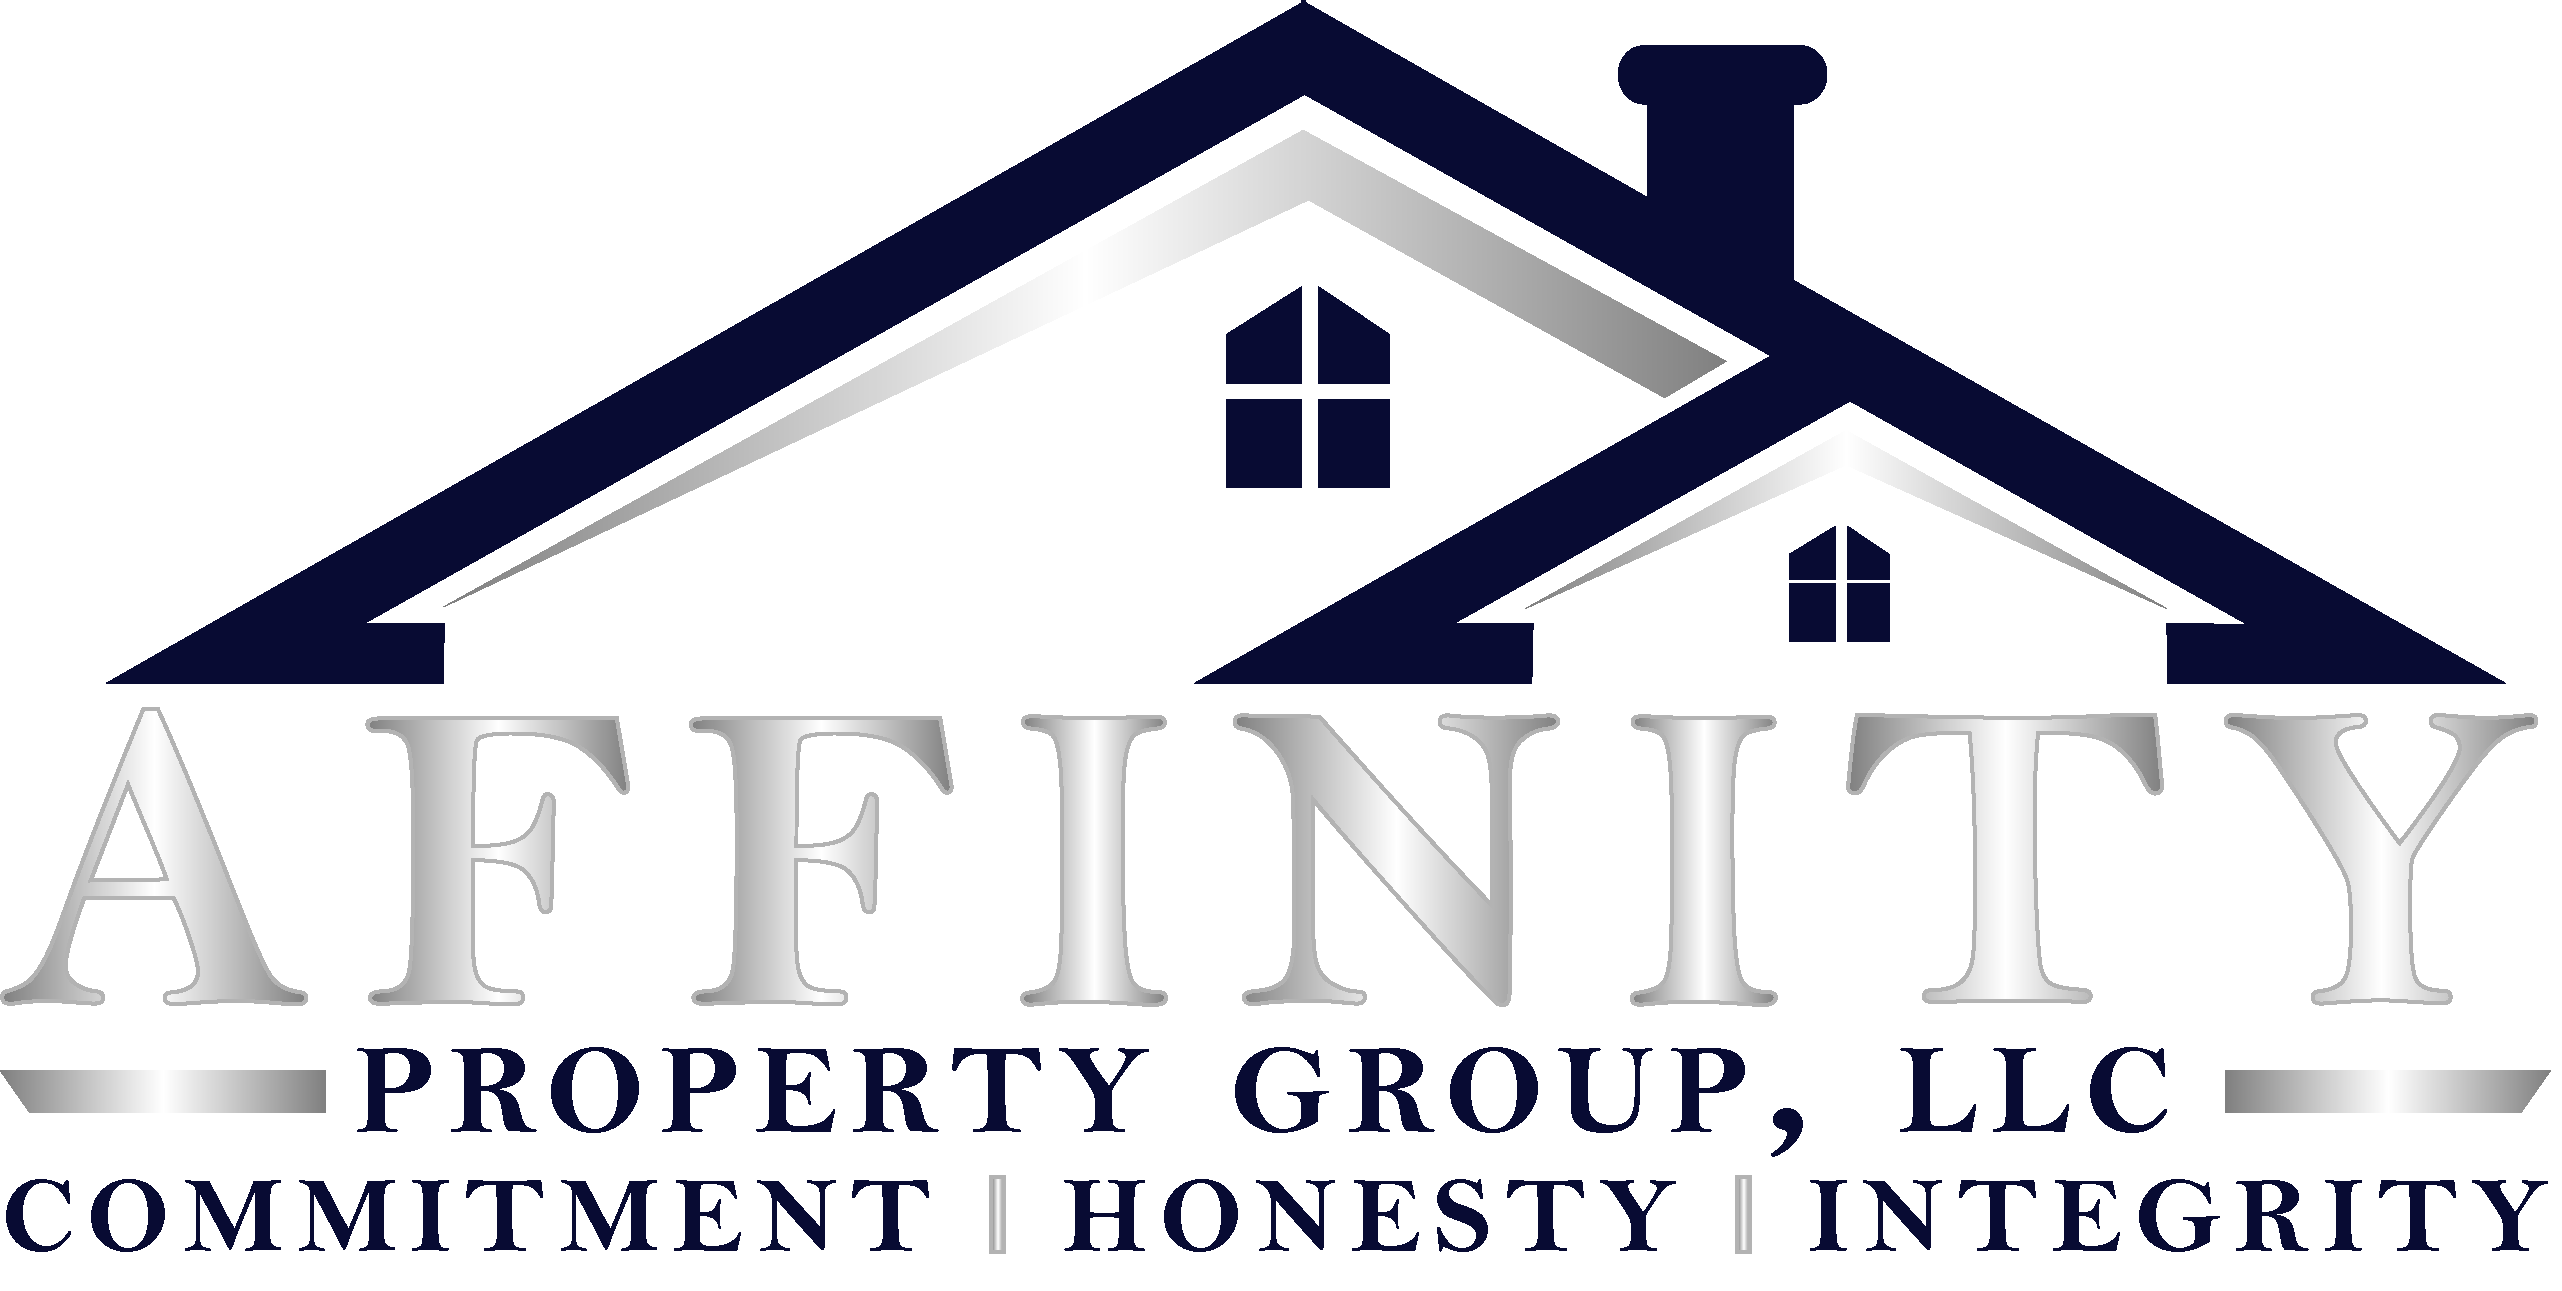 Affinity Property Group, LLC